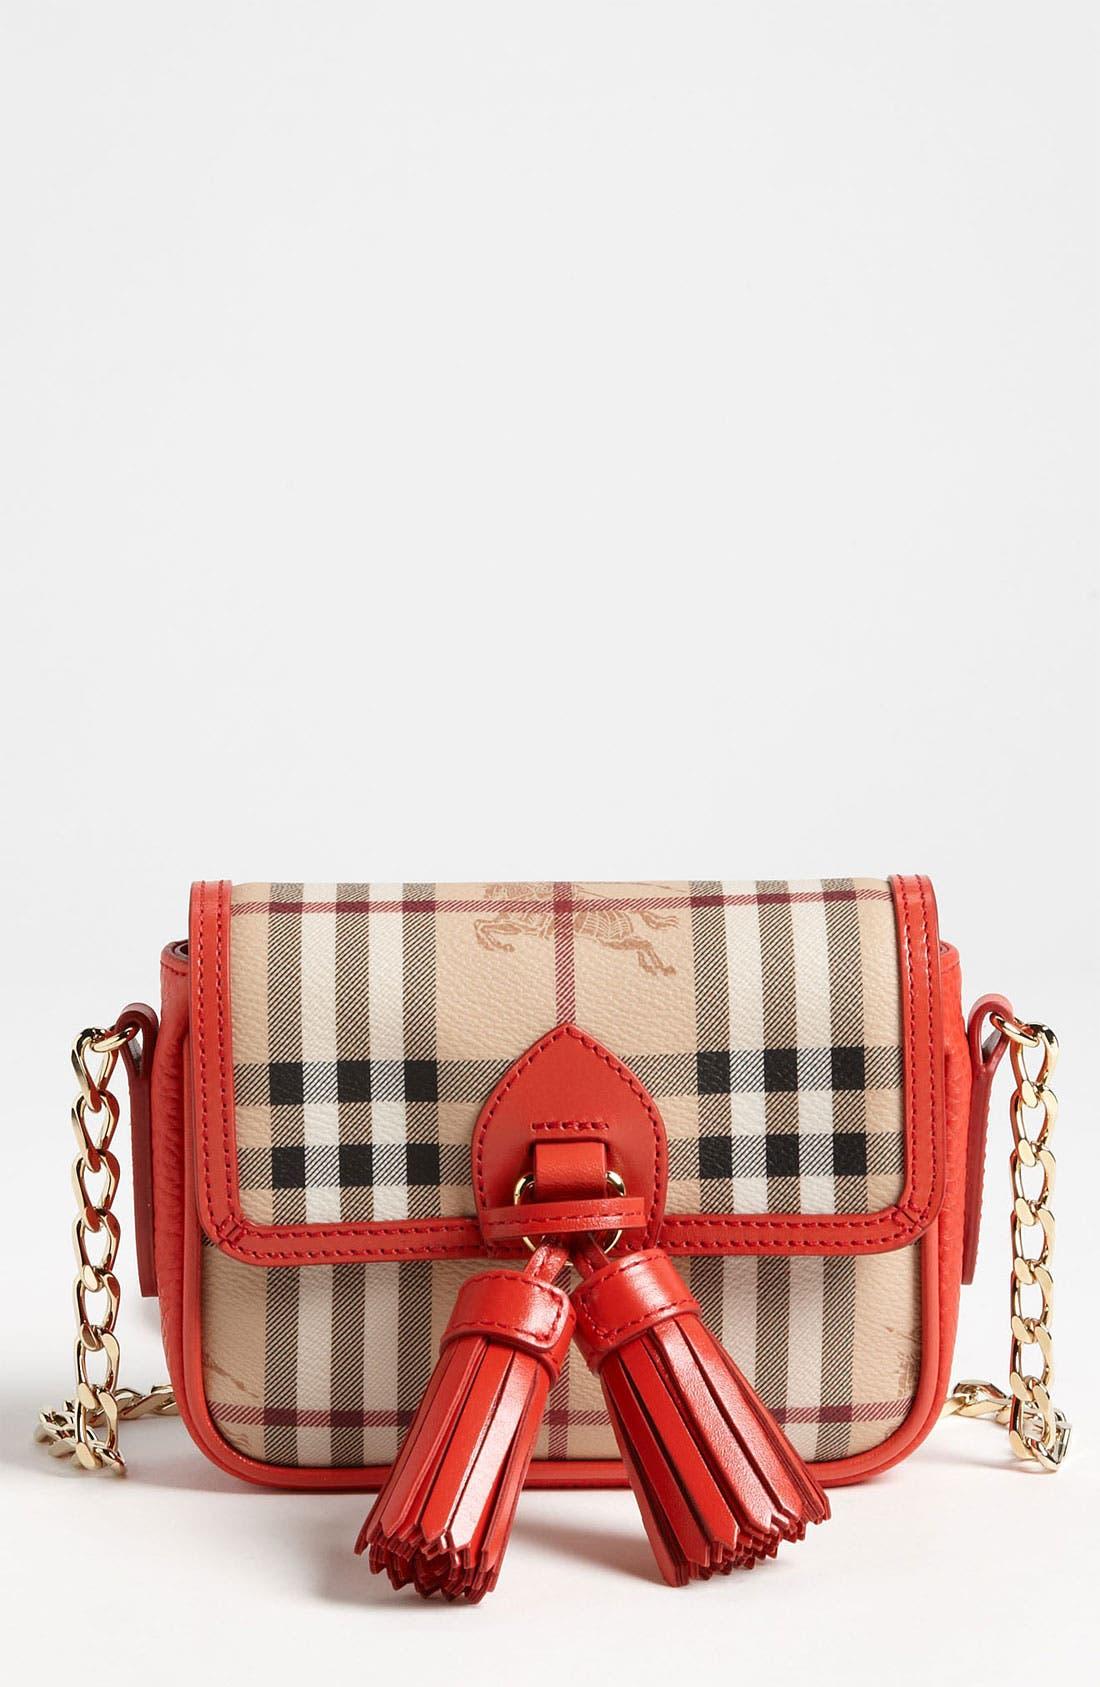 Alternate Image 1 Selected - Burberry 'Haymarket Color' Crossbody Bag